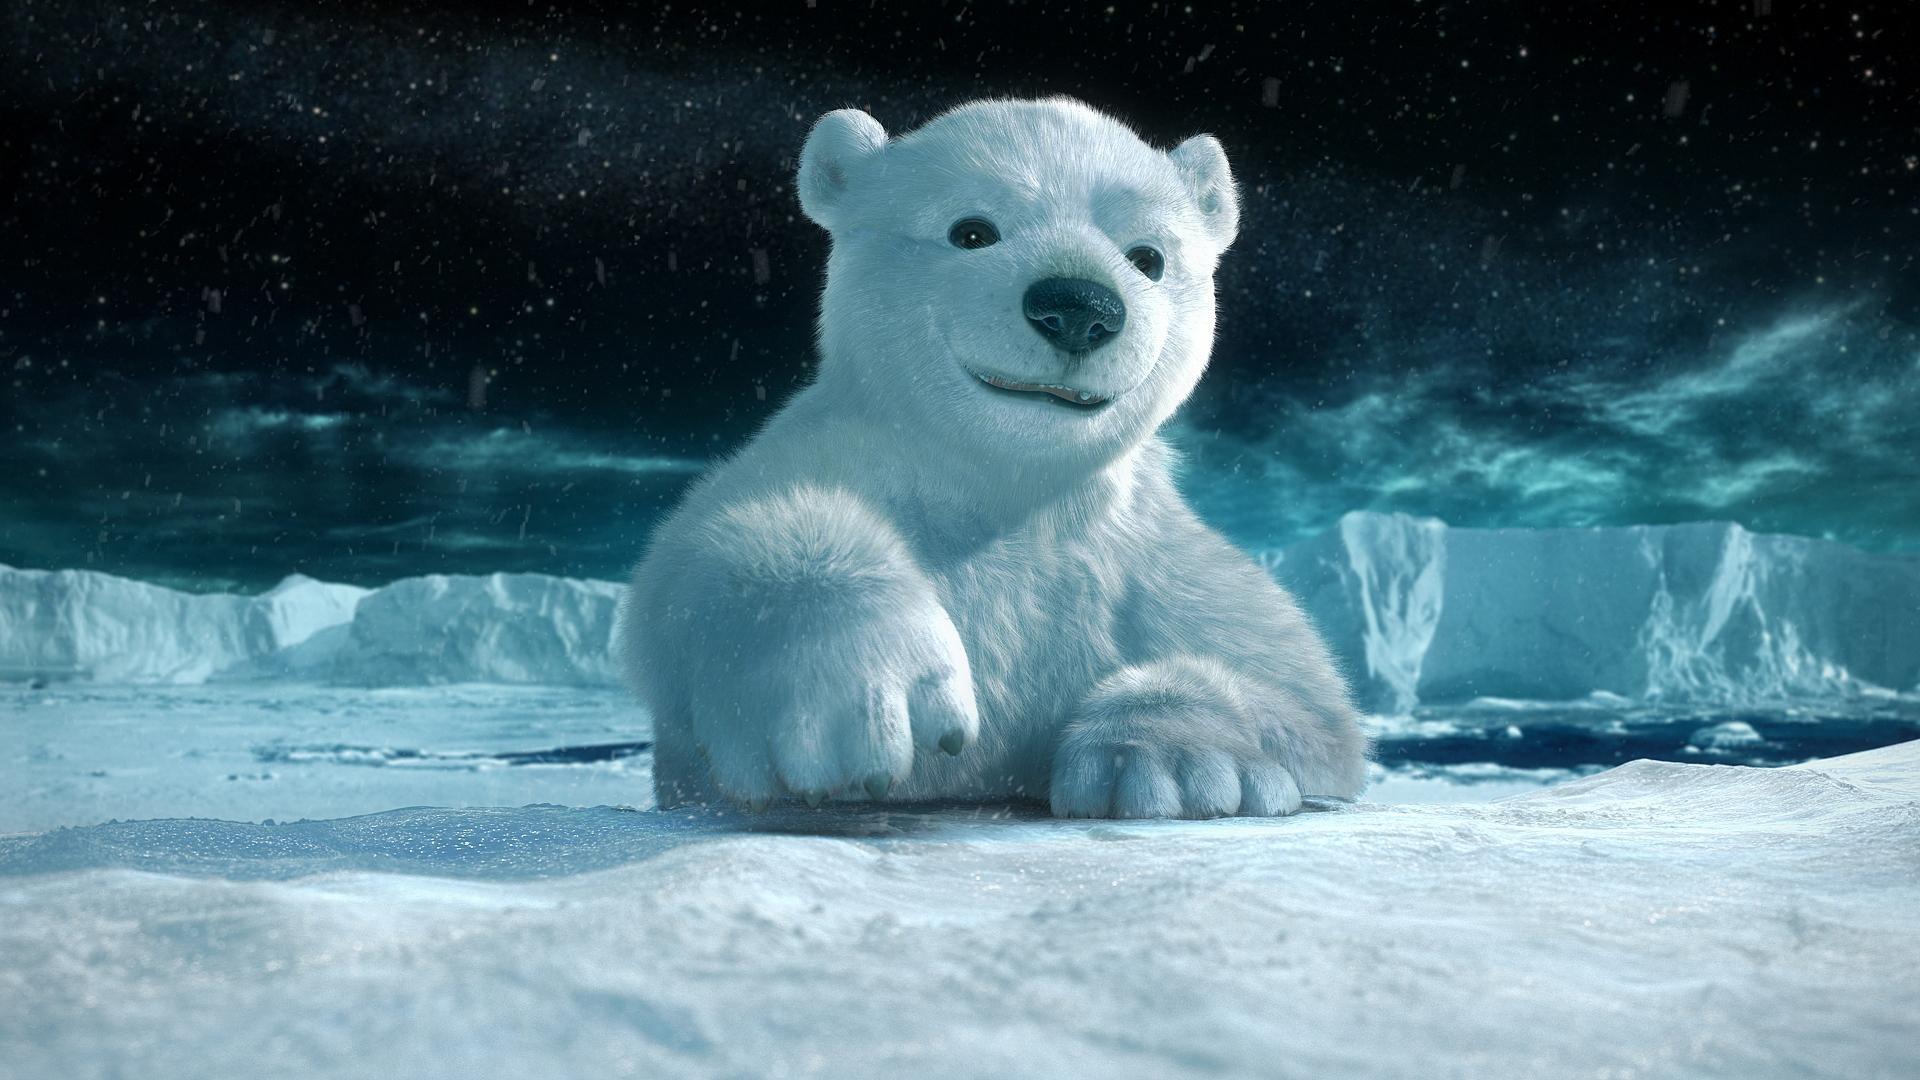 white bear polar, белый медвежонок, лезет на льдину, фото, обои на рабочий стол